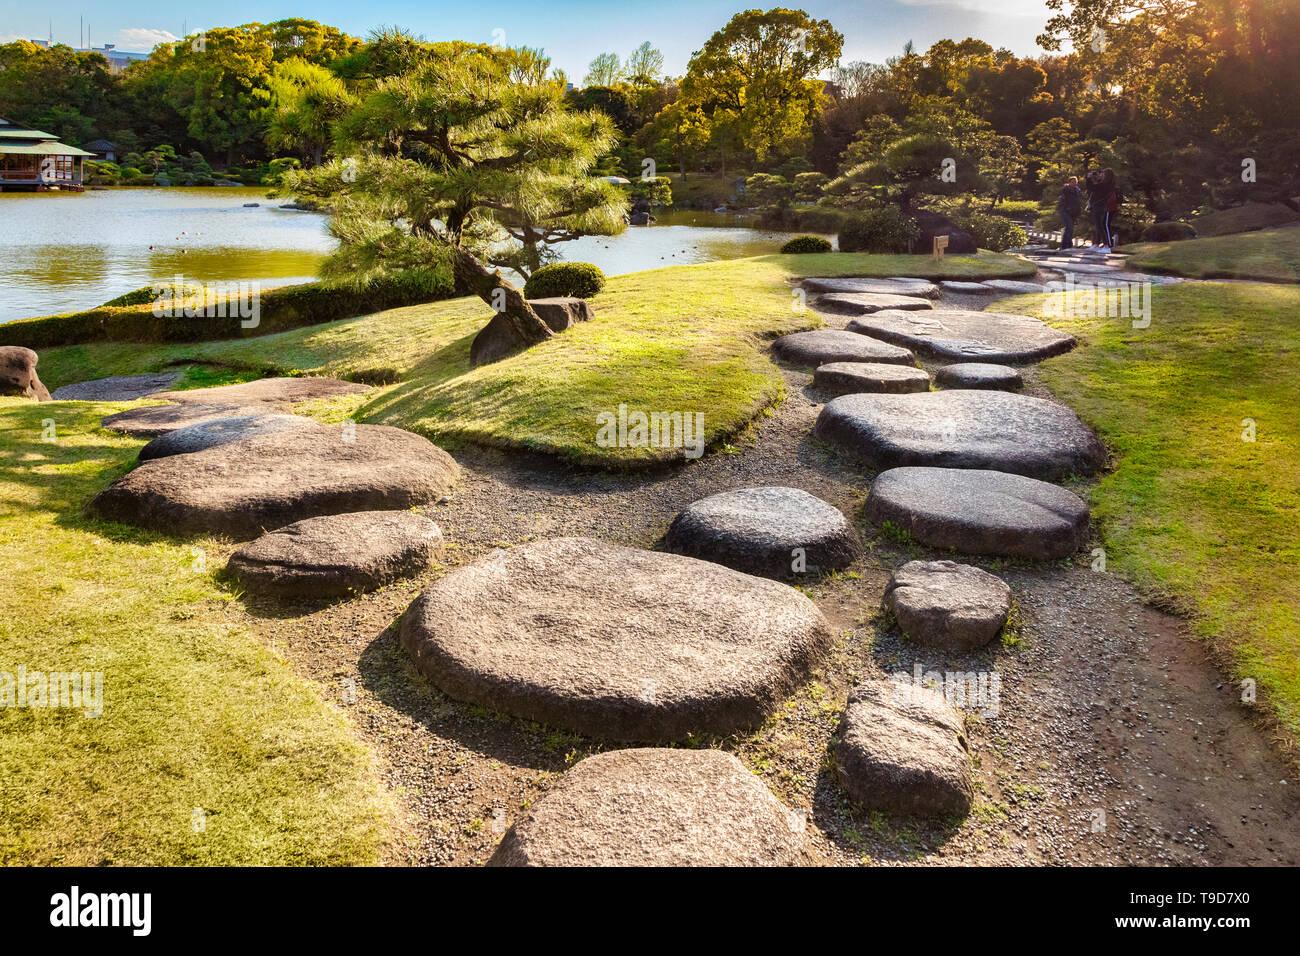 9 April 2019: Tokyo, Japan - Kiyosumi Garden, stepping stones beside the lake. Flare as sun sets on top right. Stock Photo